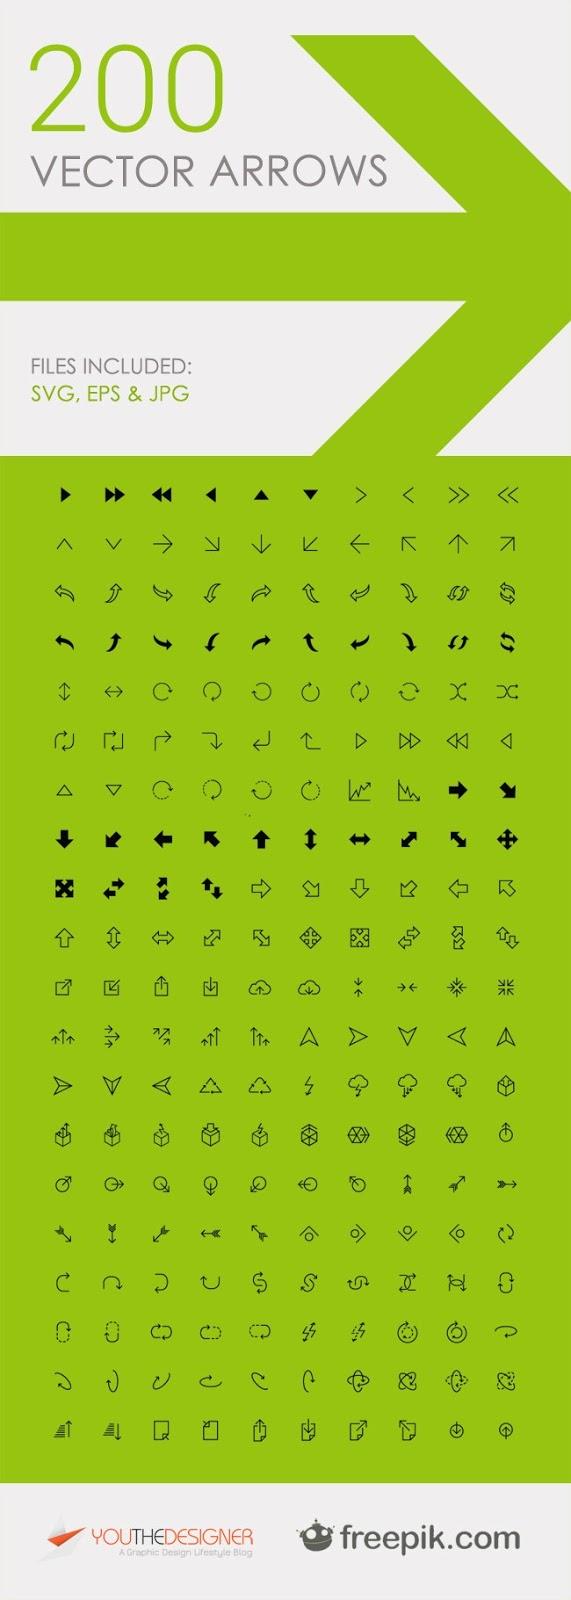 200 Free Vector Arrow Icons